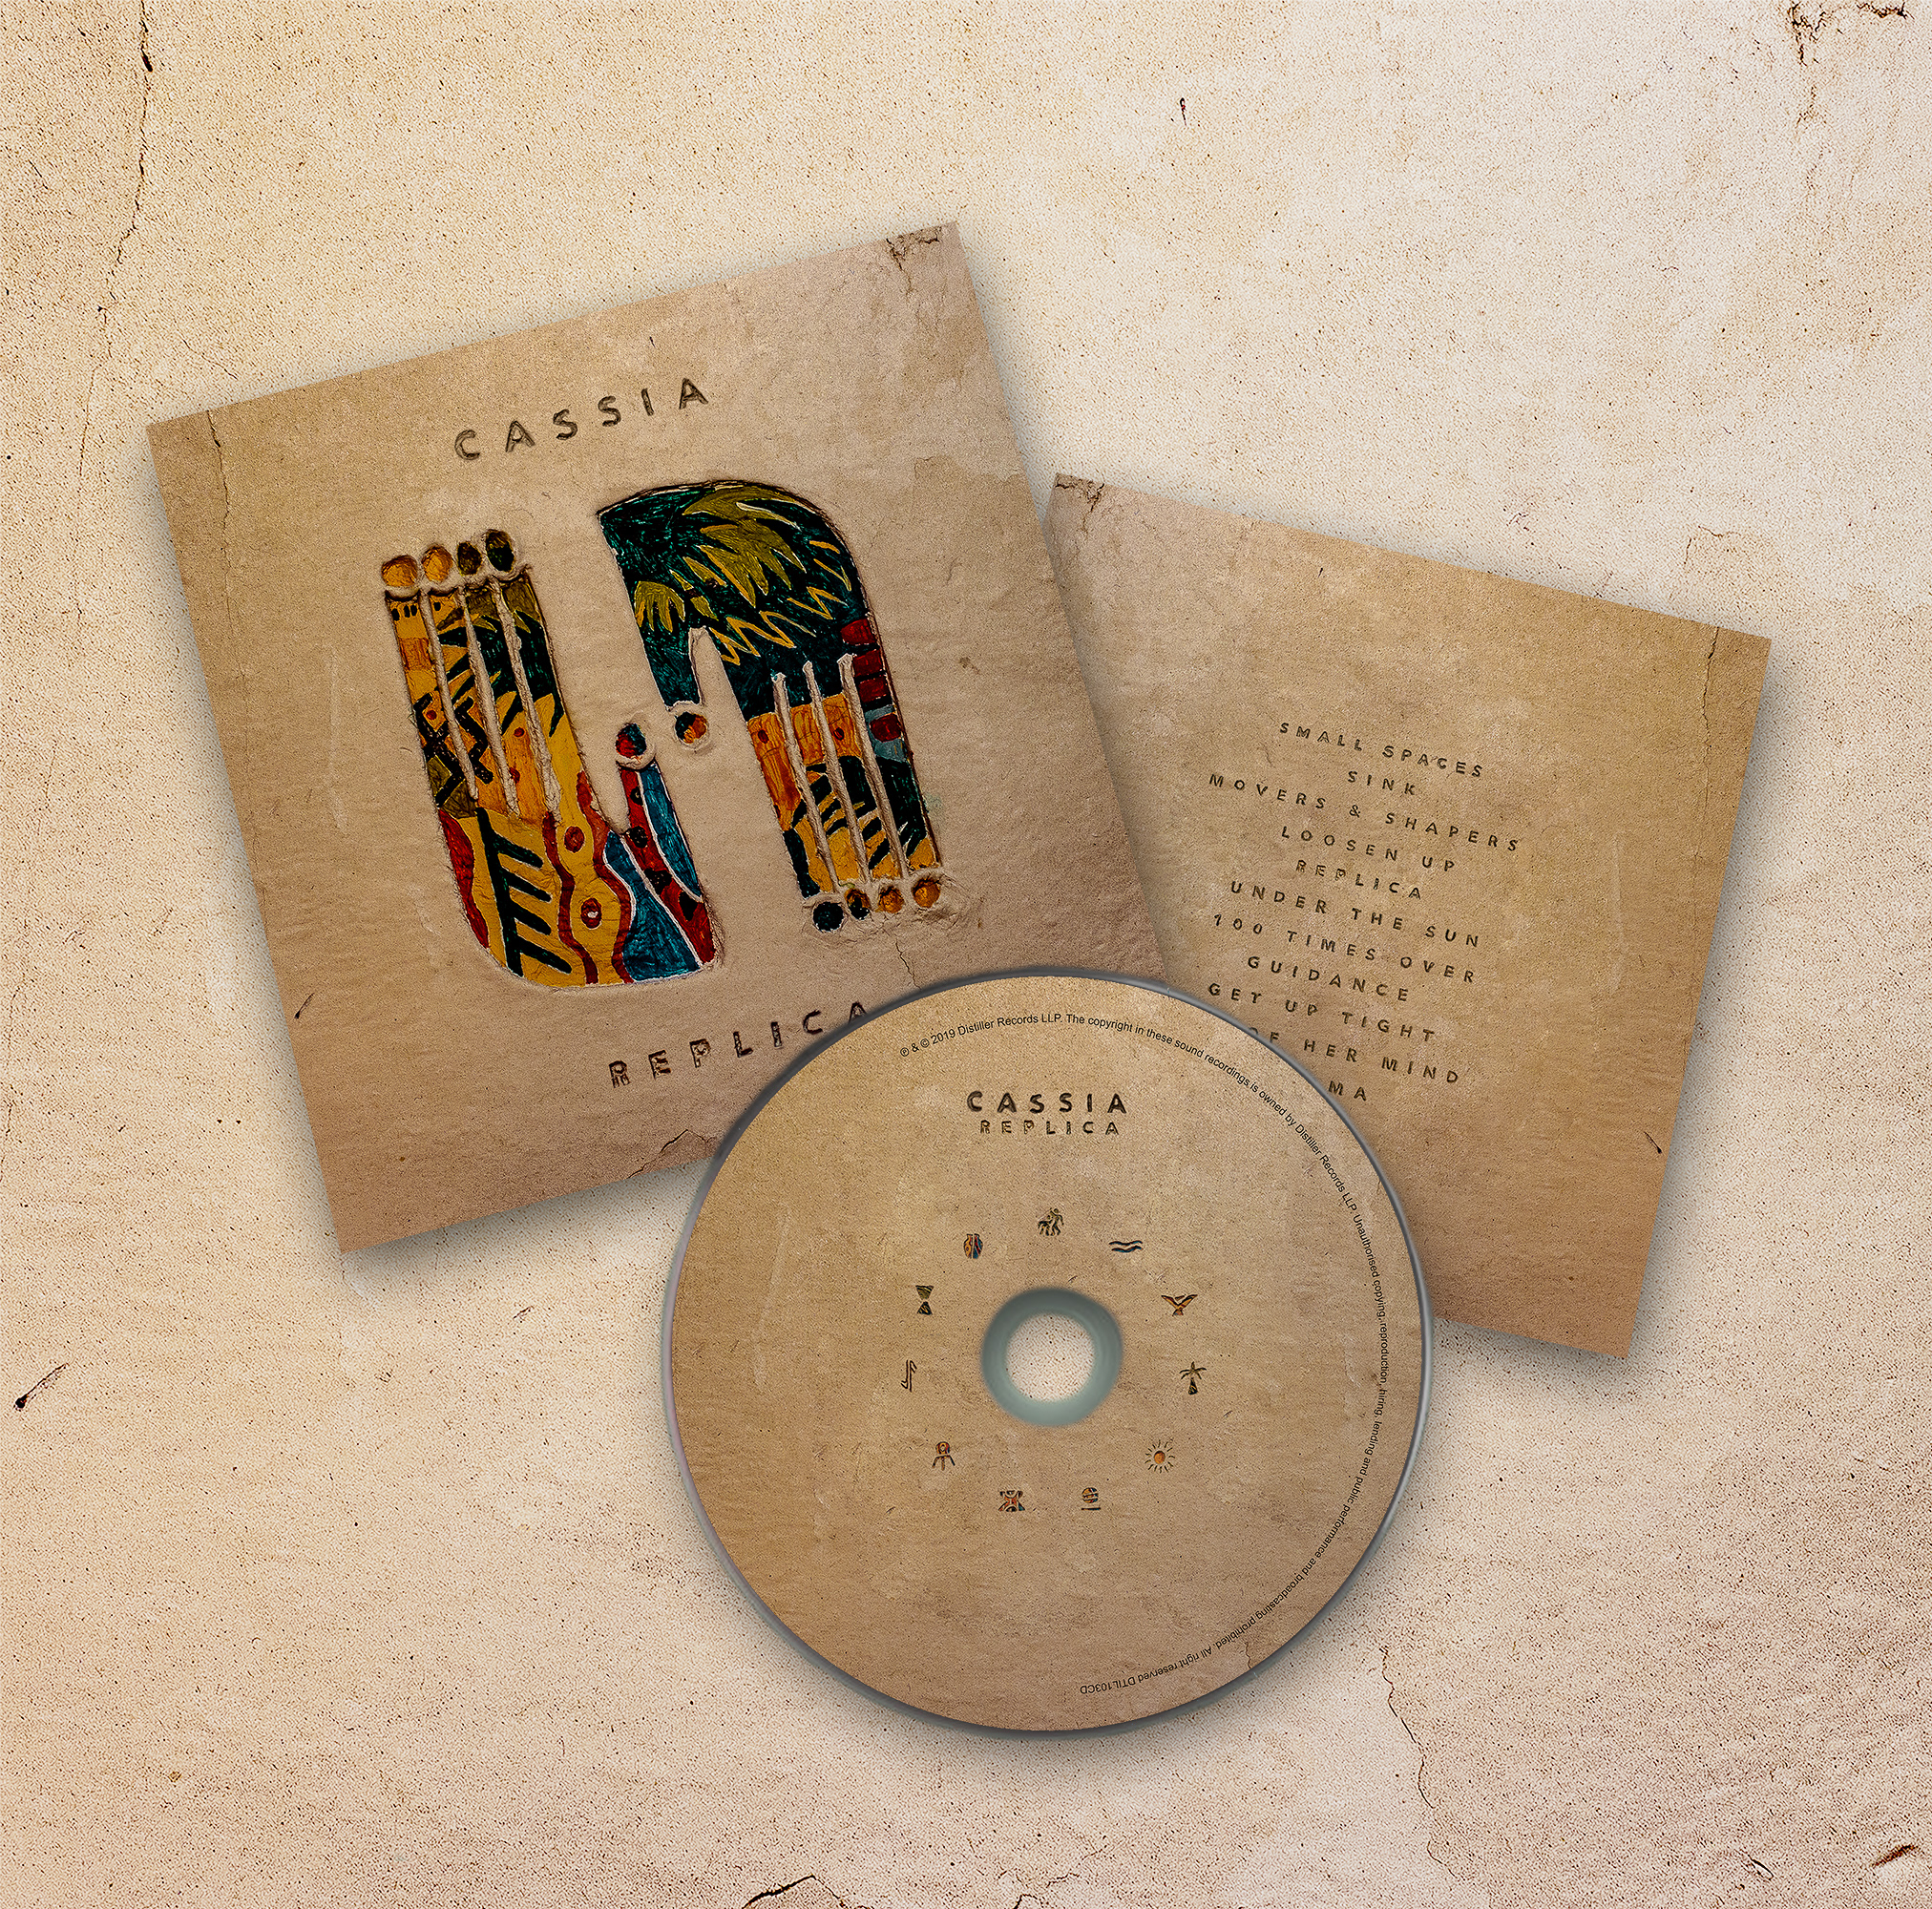 Replica - CD + signed picture - Cassia